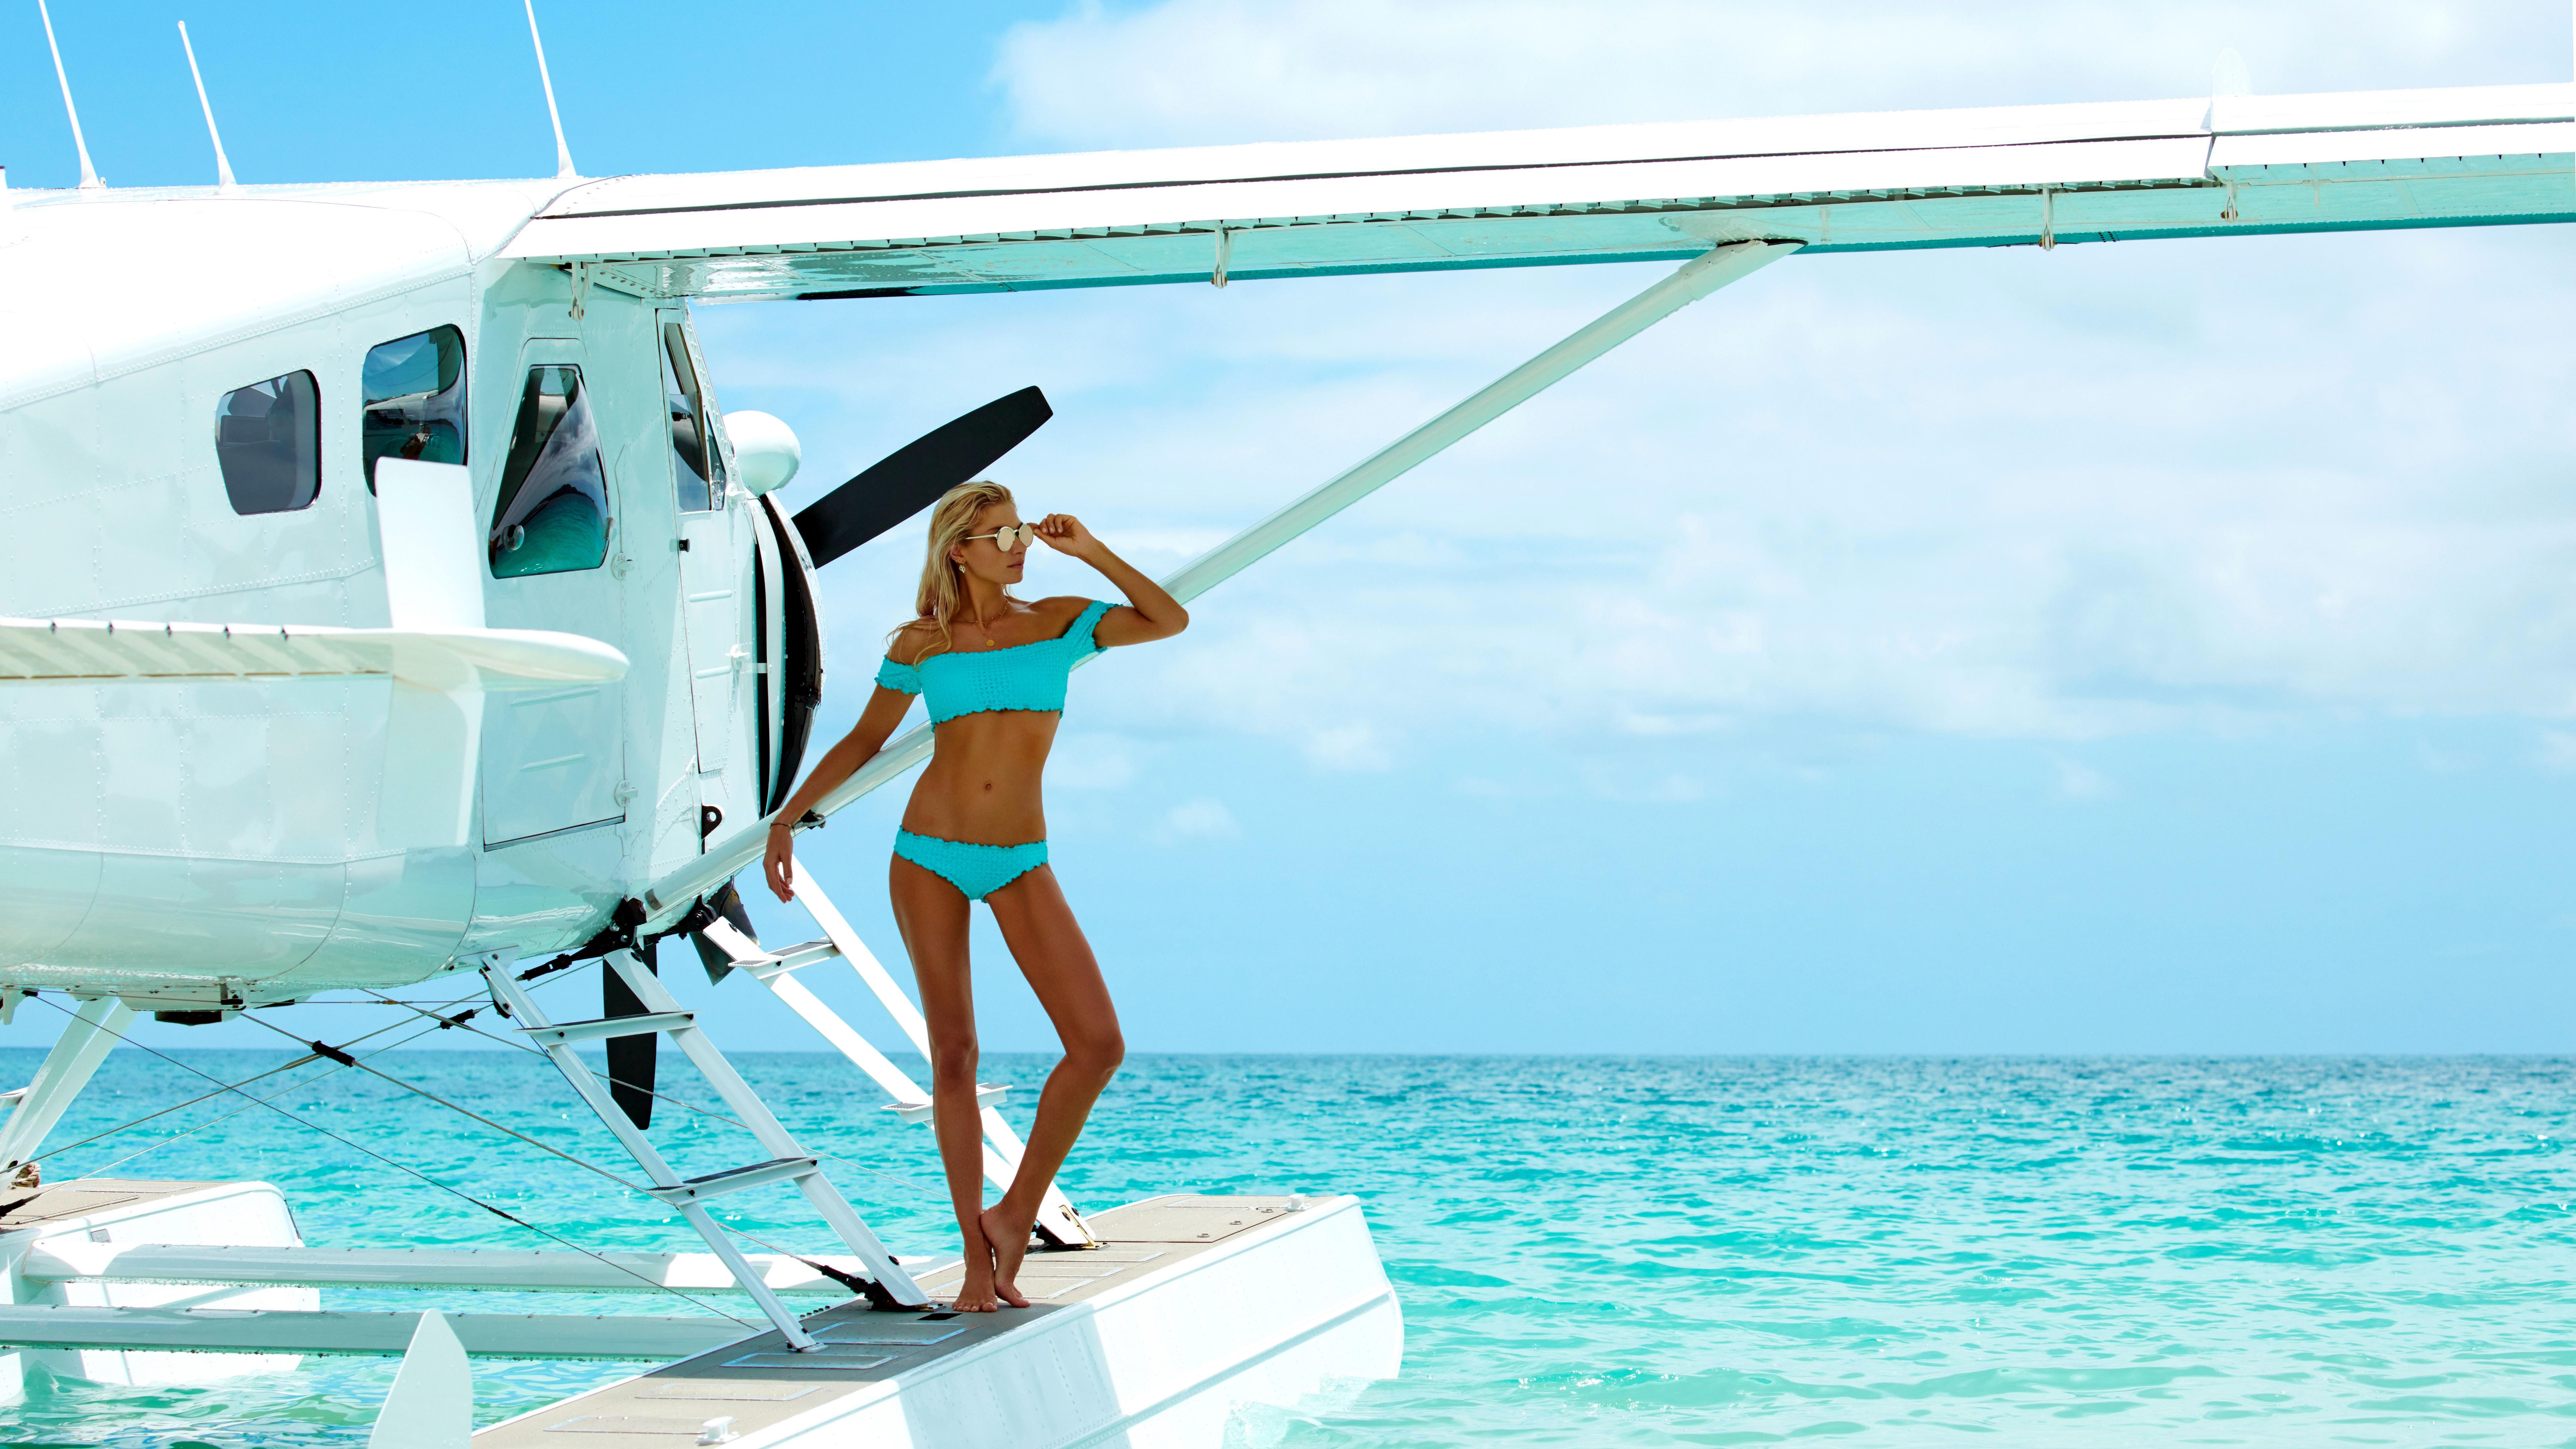 People 7680x4320 Jessica Hart bikini Seaplane sunglasses women with shades belly belly button model women